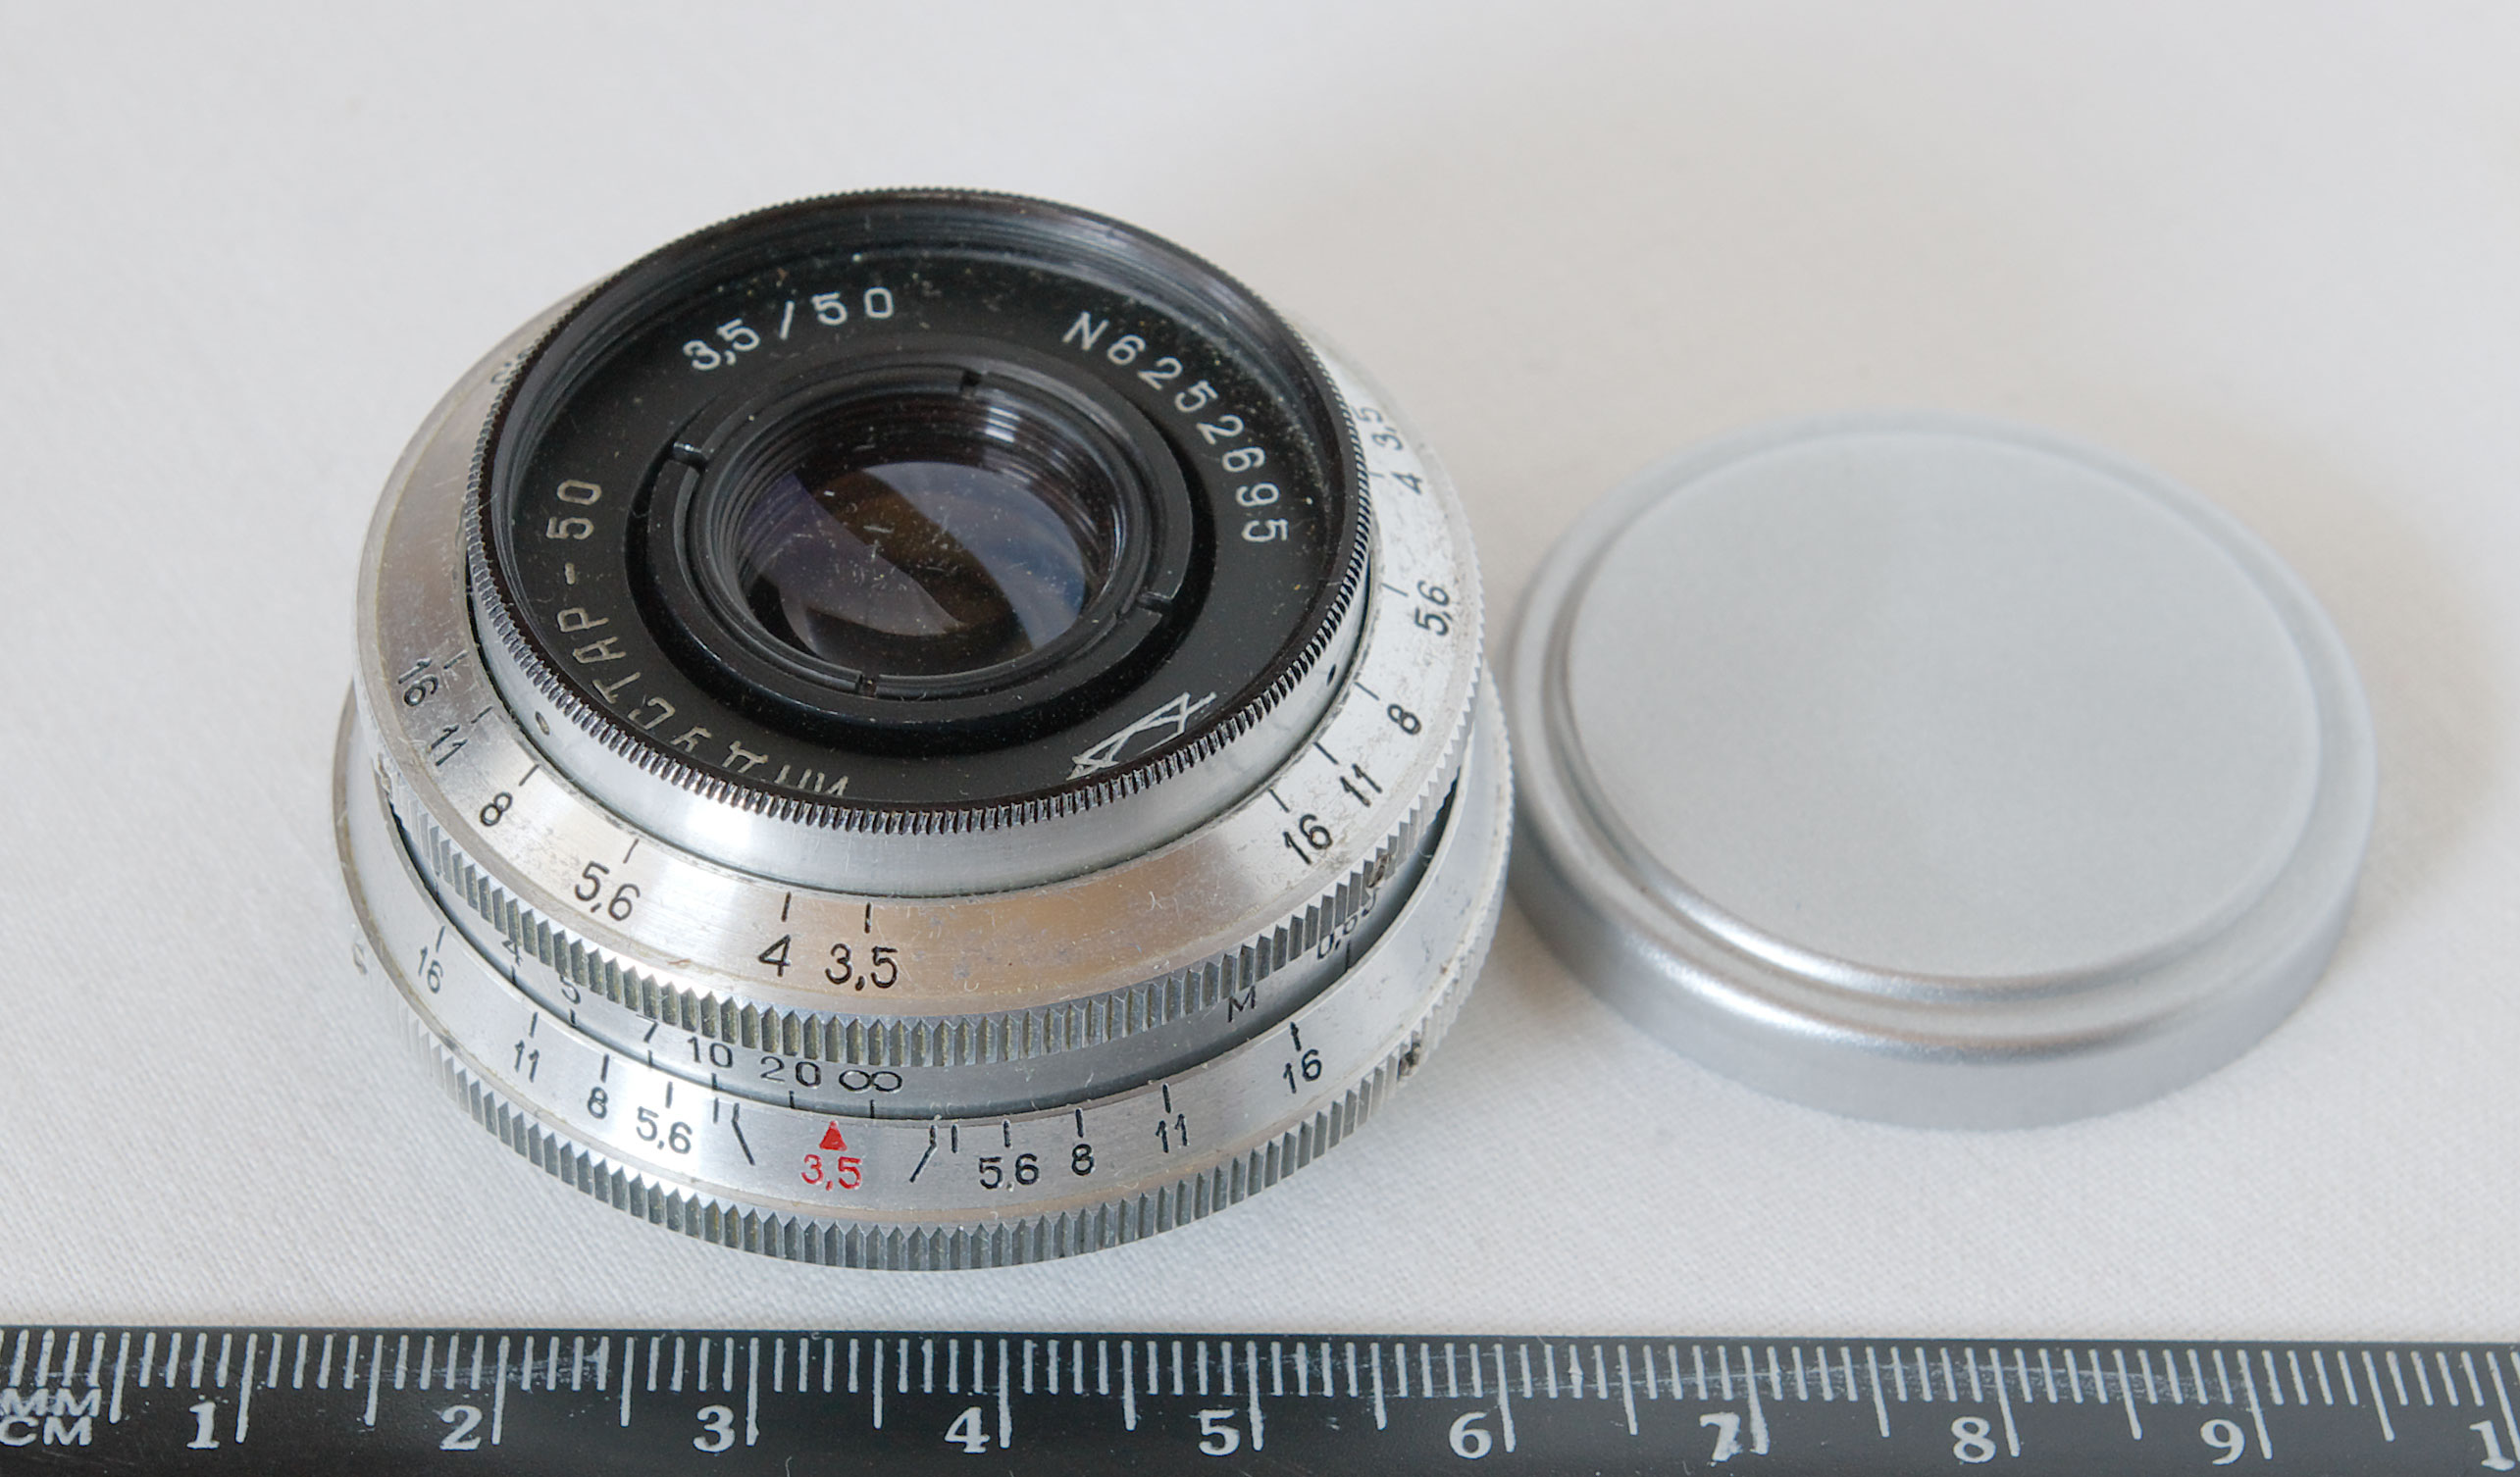 https://upload.wikimedia.org/wikipedia/commons/3/39/Industar50_SLR_M39.jpg